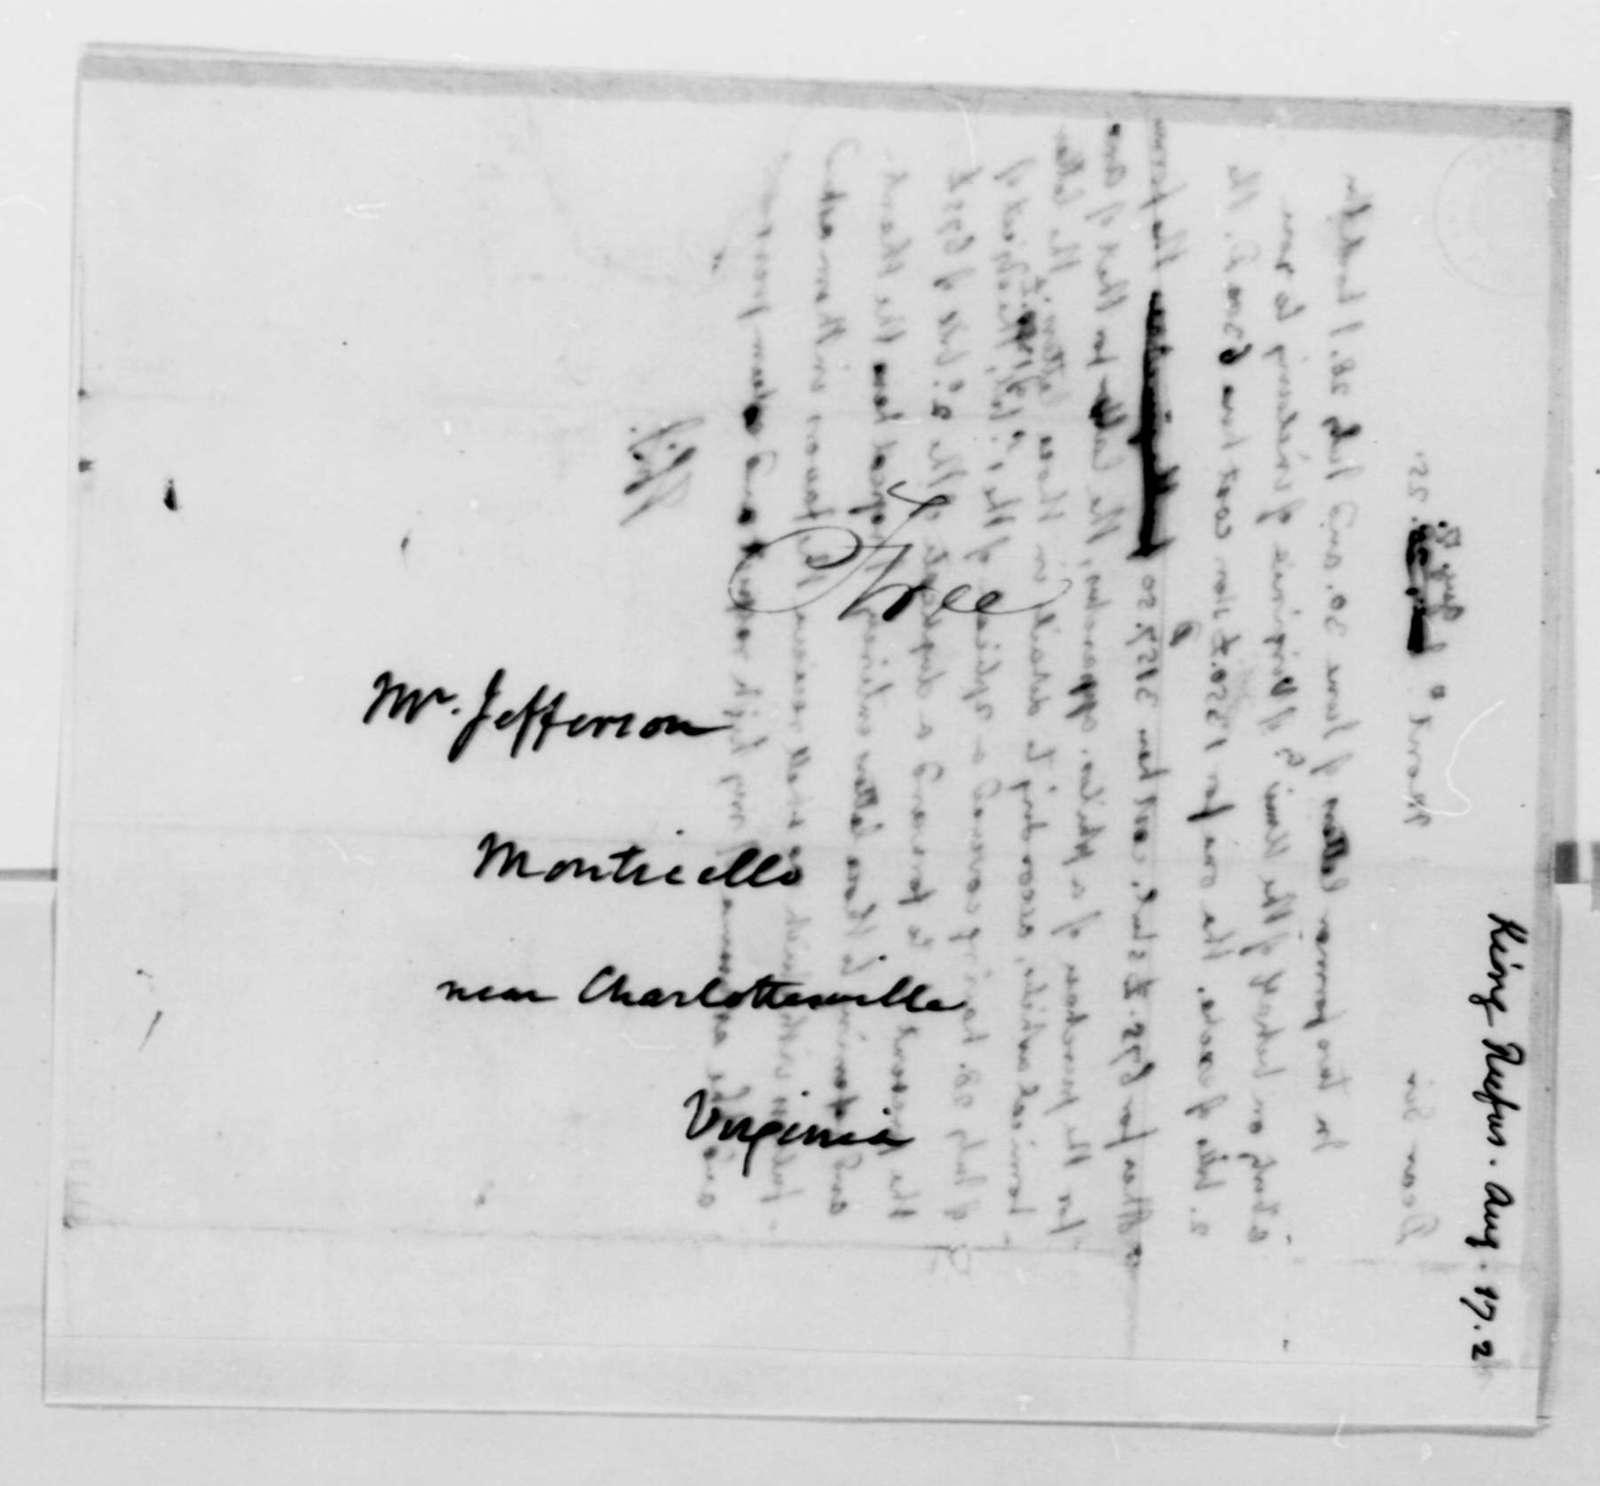 Thomas Jefferson to Rufus King, August 17, 1825